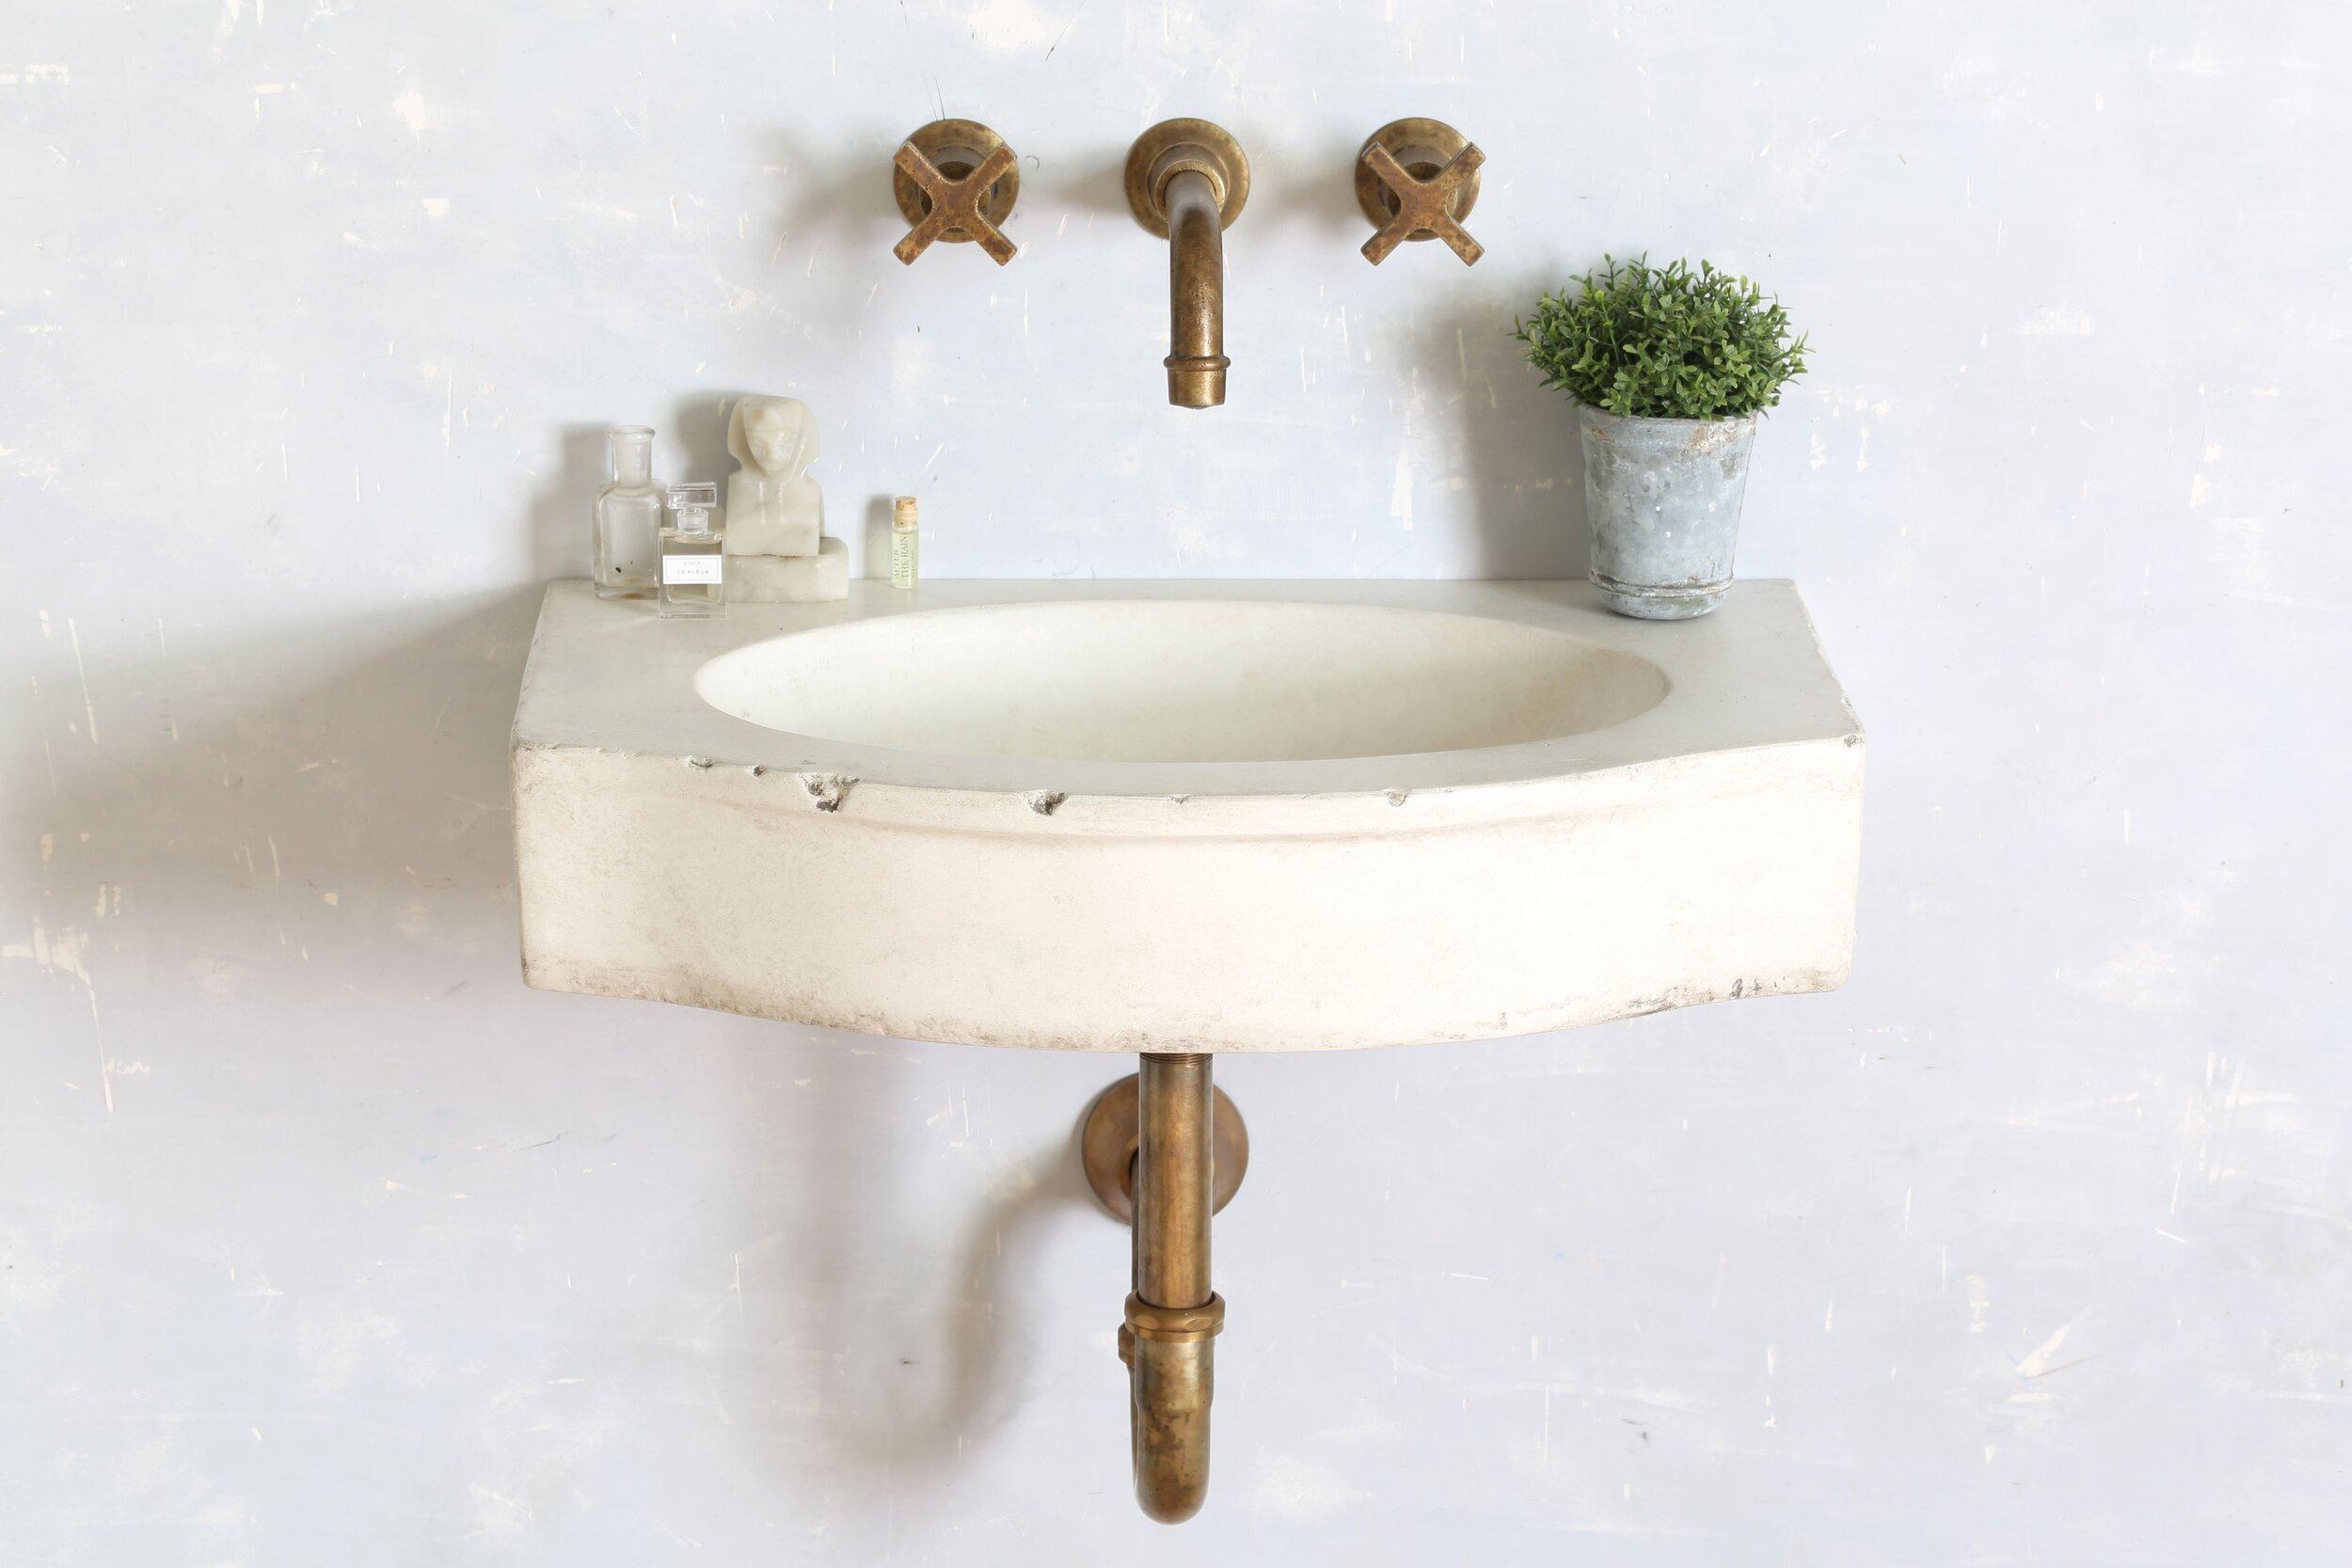 22 mallorca sink bathhouse cross handle wall mount faucet drain bundle atmosphyre